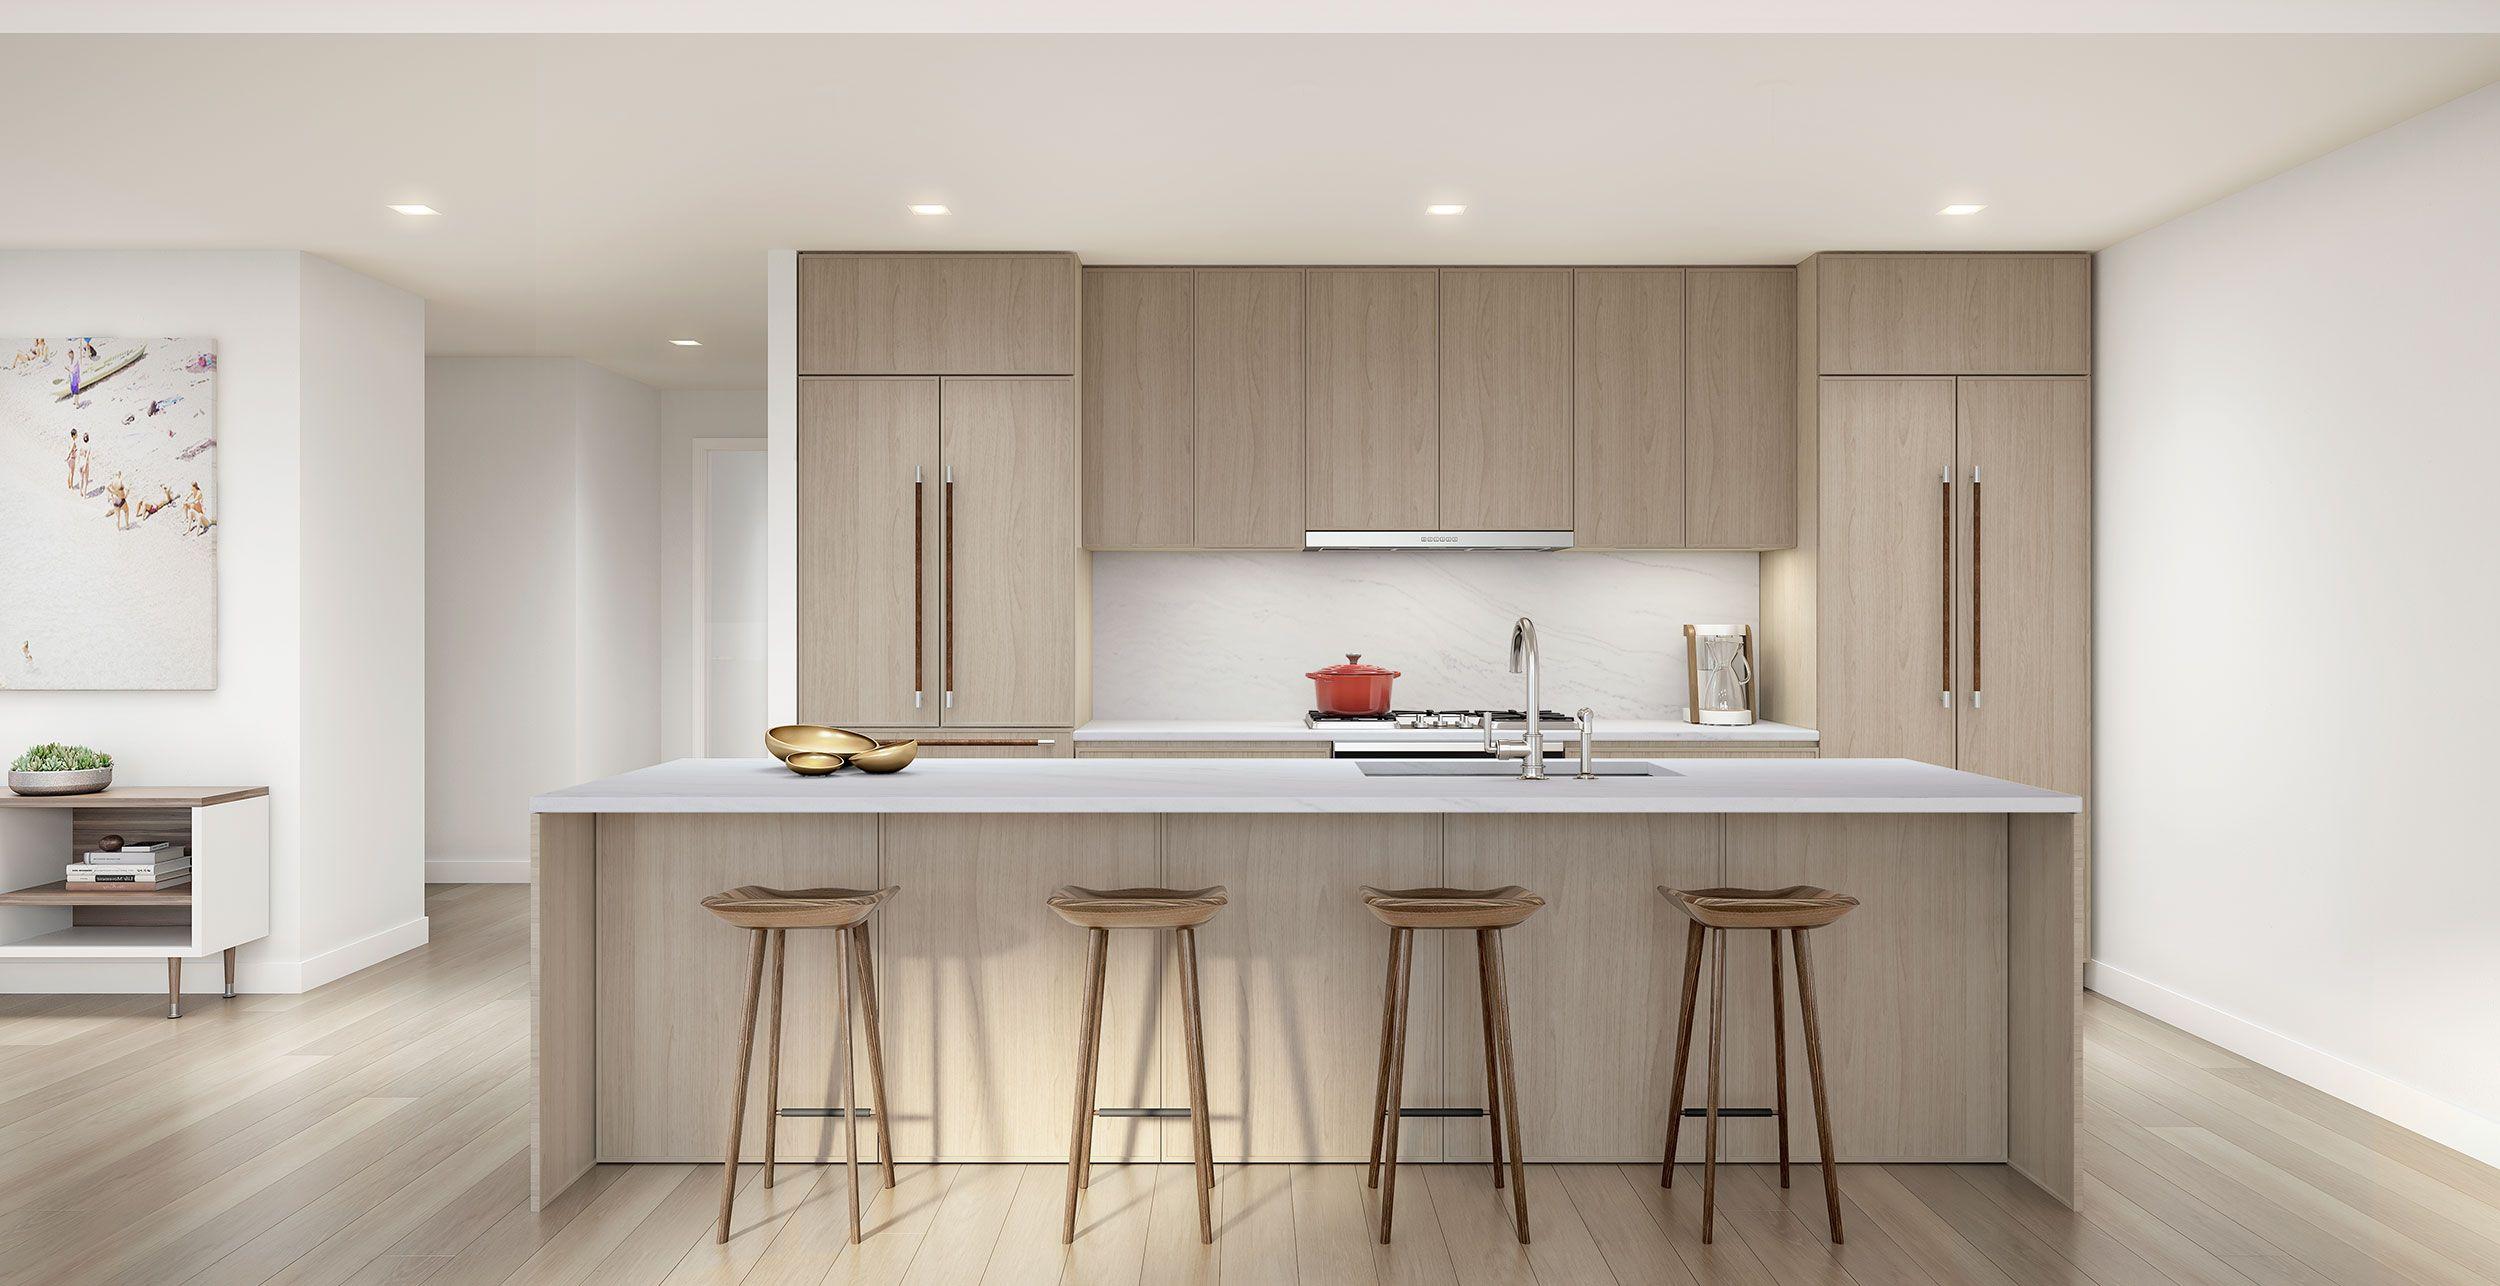 kitchens boast italian custom cabinetry with refined